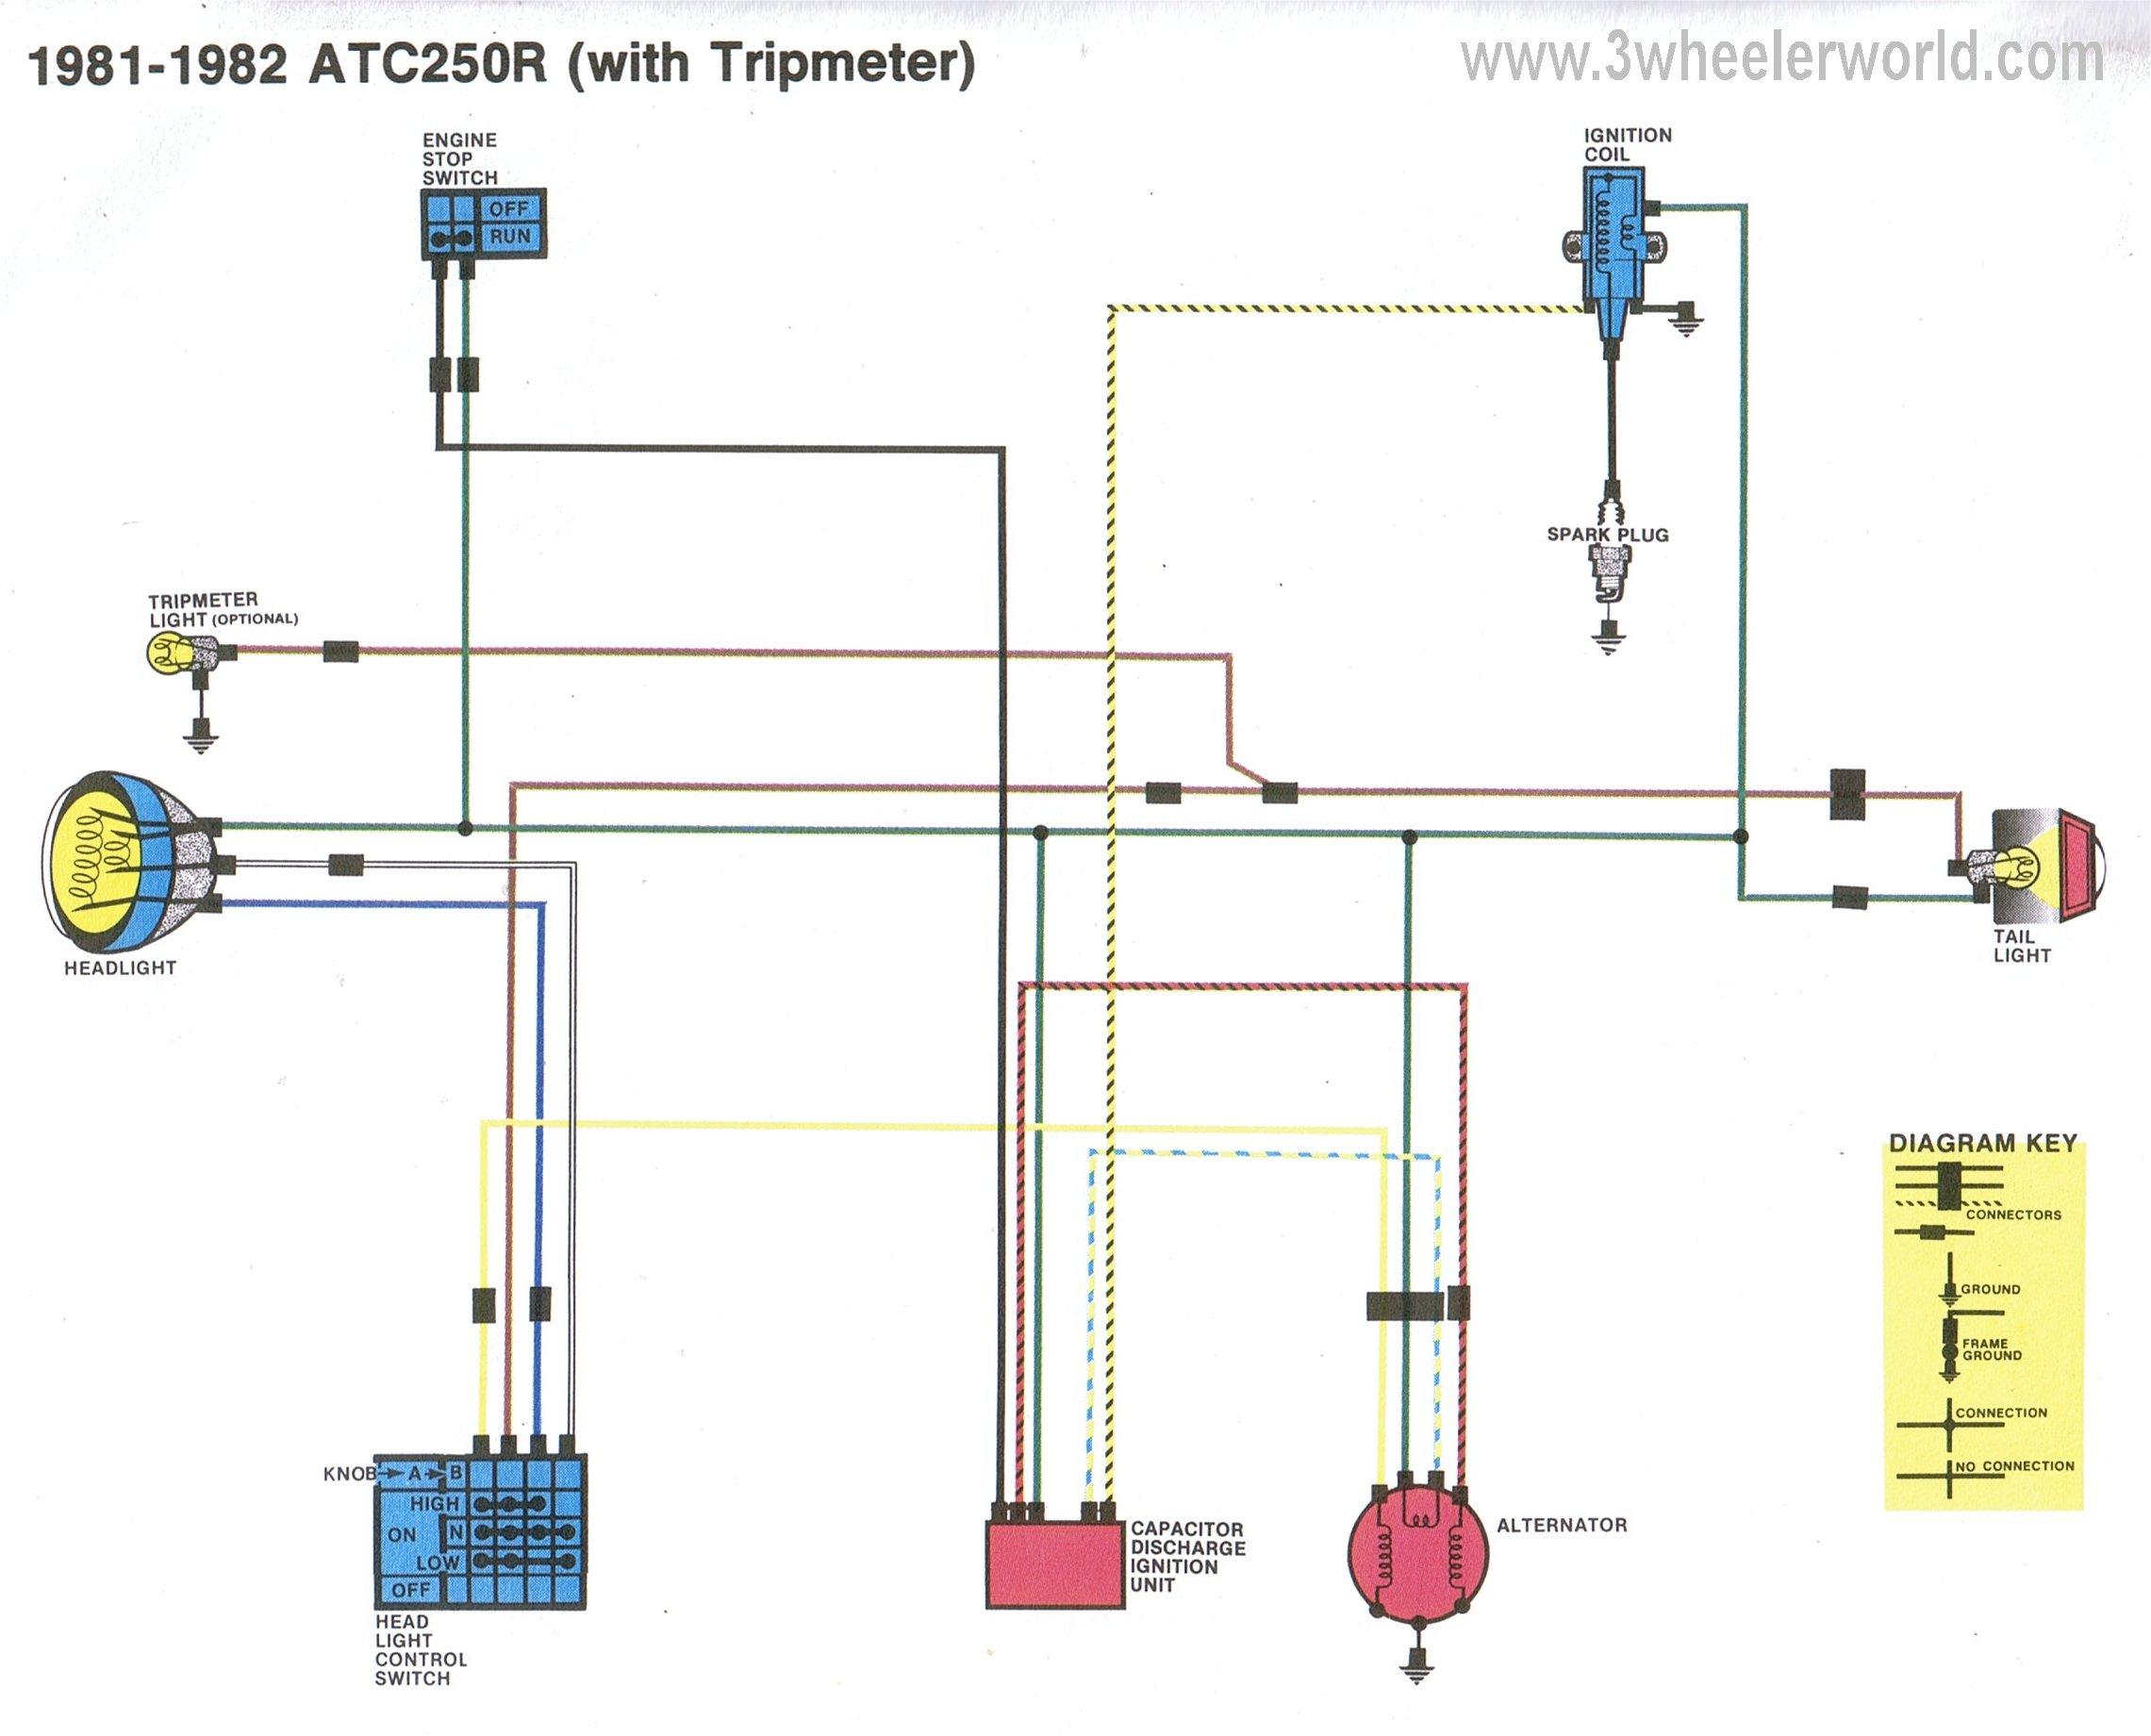 Honda Atc 70 Wiring Diagram - Var Wiring Diagram child-clearance -  child-clearance.europe-carpooling.it | Trx70 Wiring Diagram |  | child-clearance.europe-carpooling.it